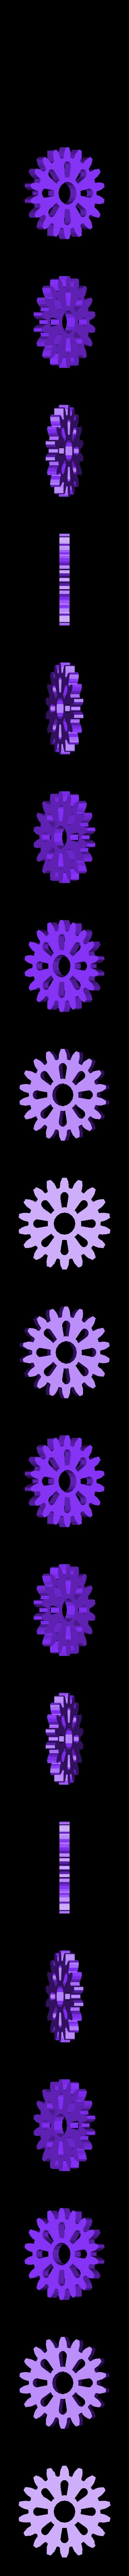 ing cover 11.stl Download free STL file cover gears for xiaomi mi A1 • 3D print object, Delli98